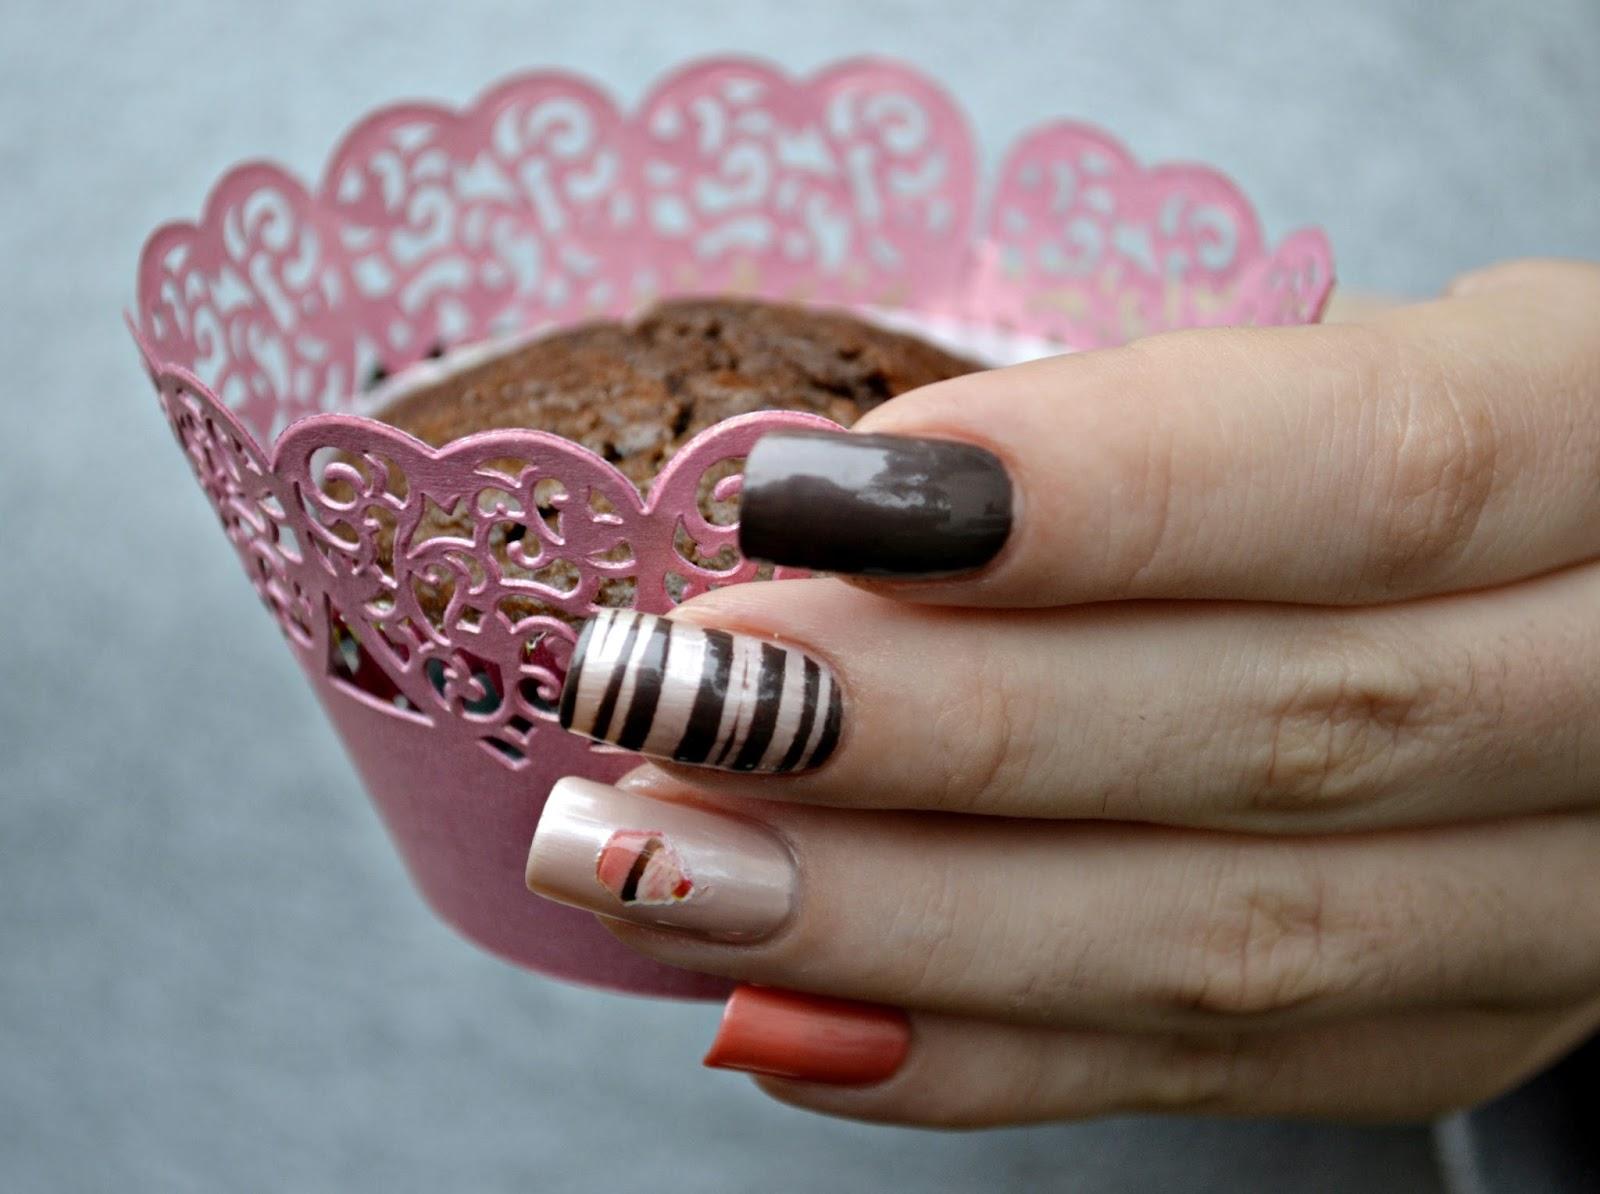 Skittlette muffins manicure